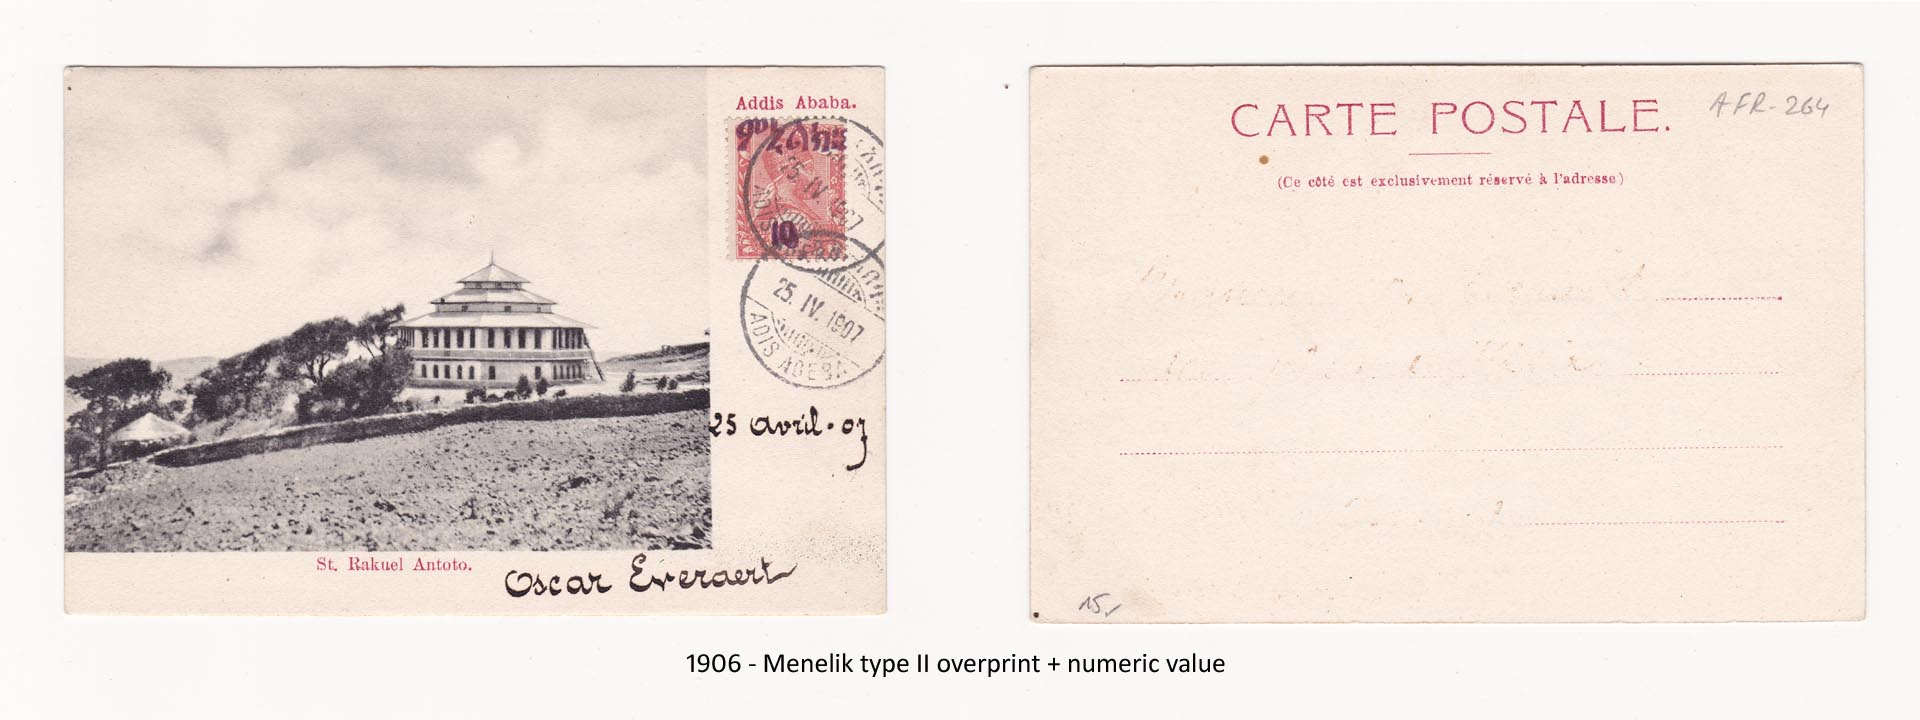 1906 - Menelik type II overprint + numeric value